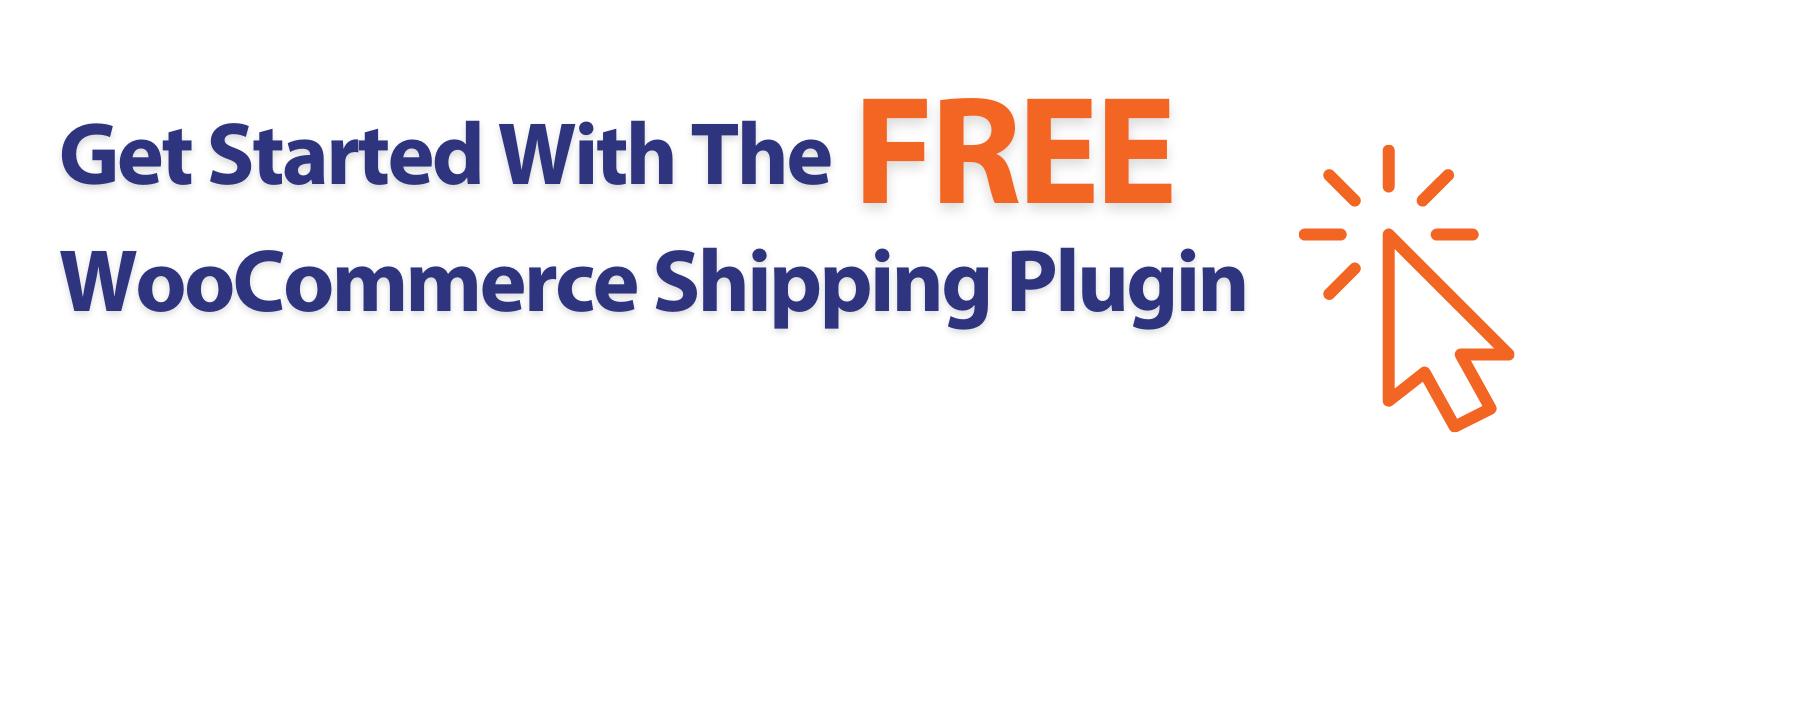 Transdirect Woocommerce shipping plugin